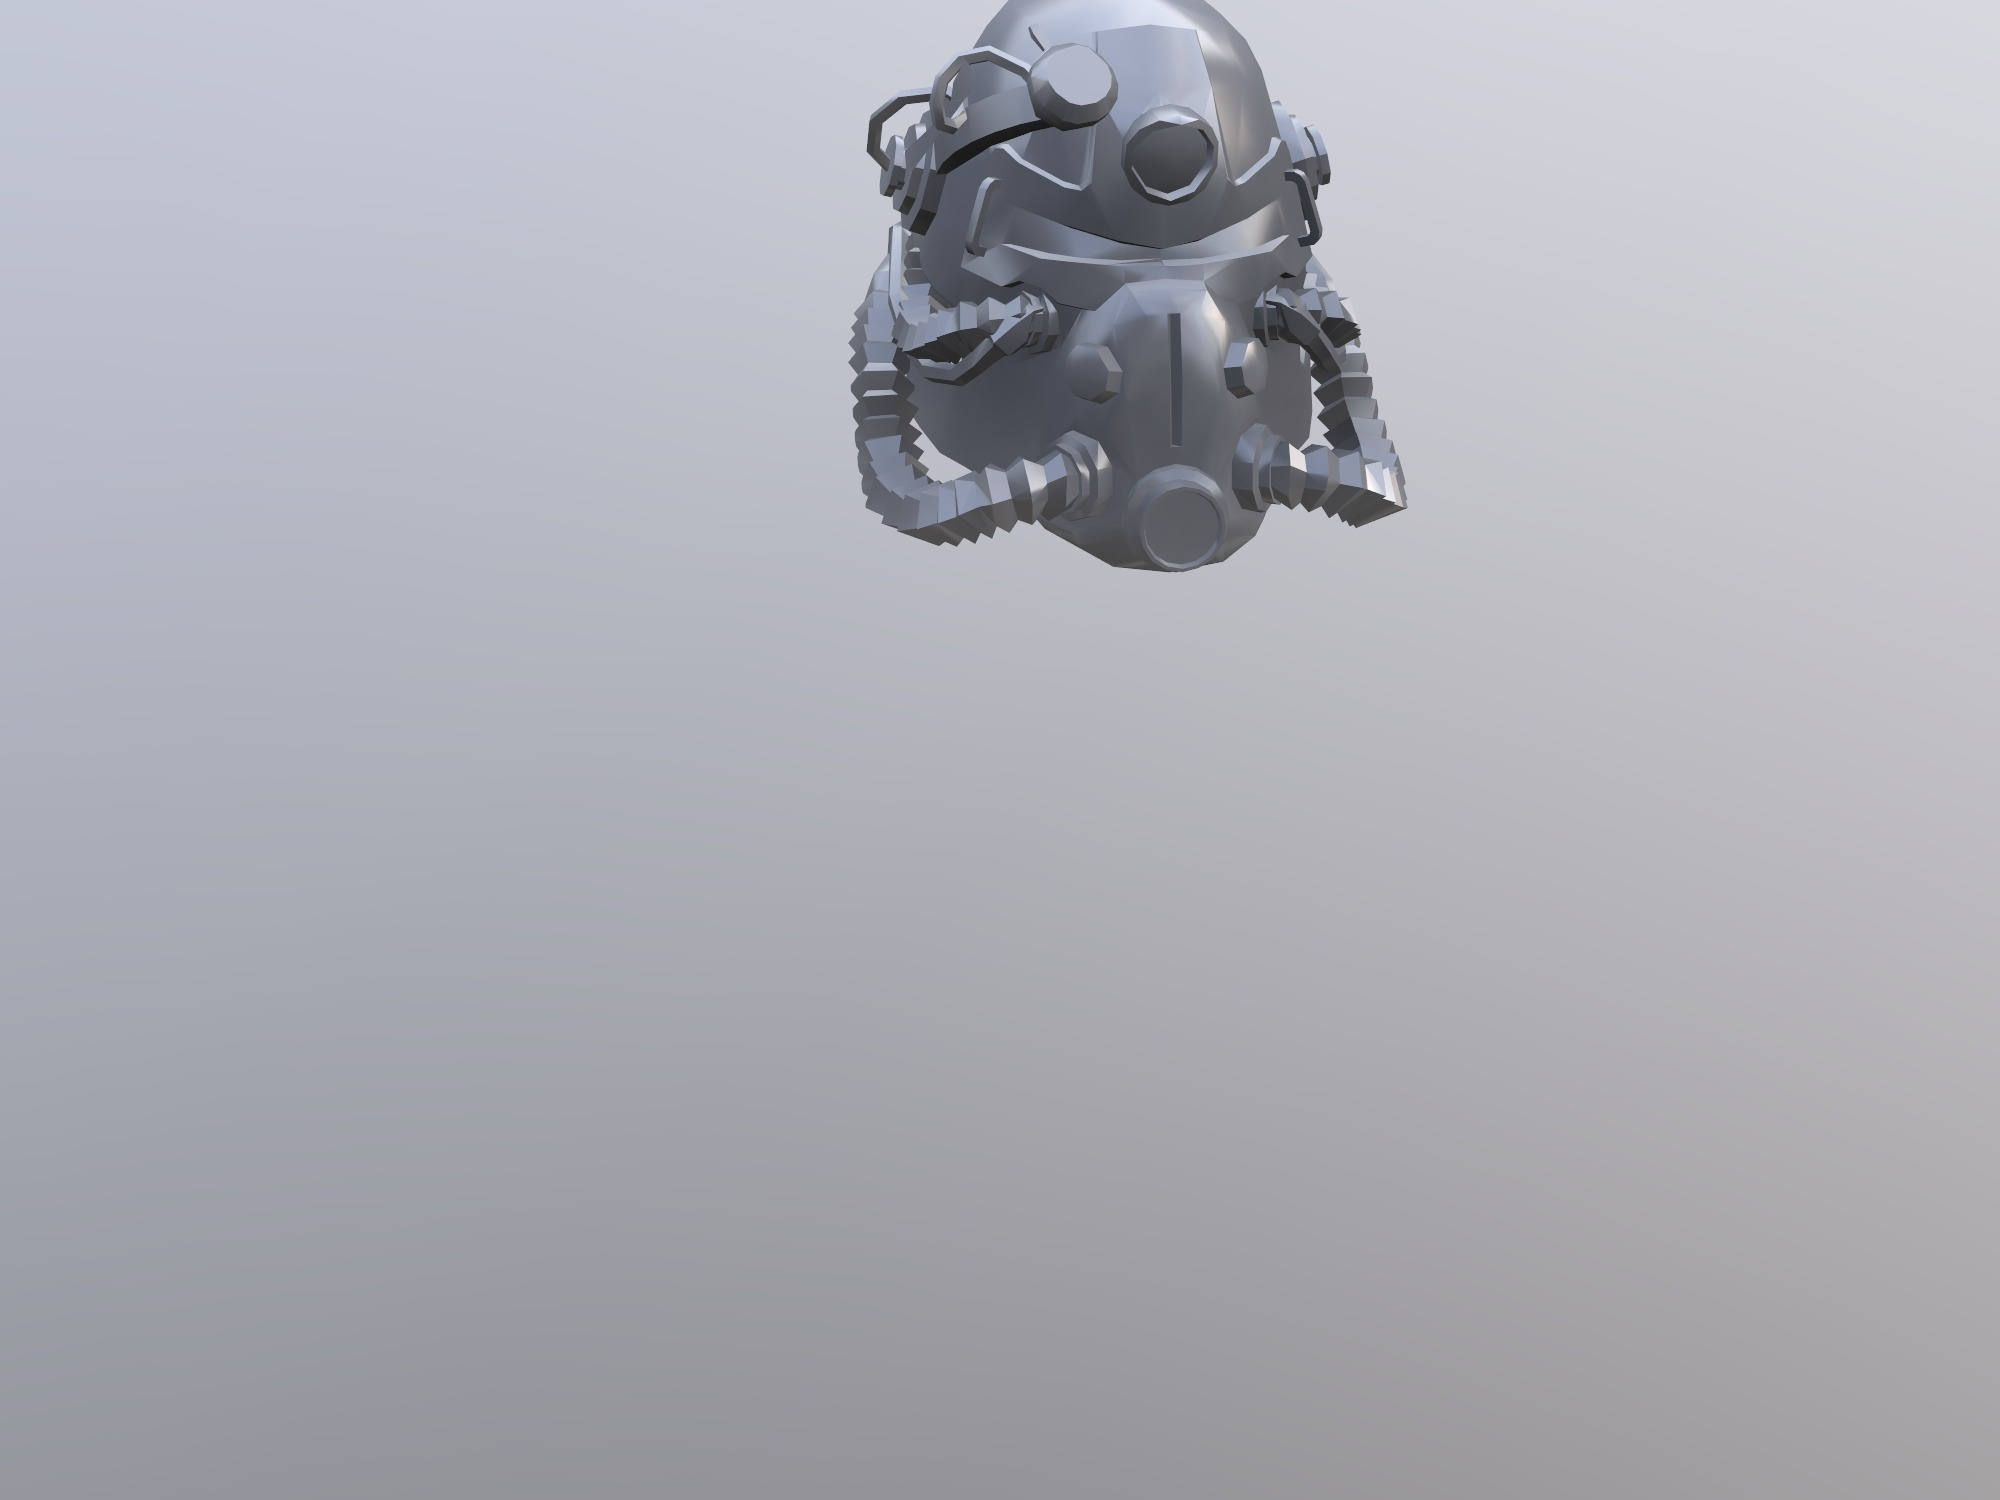 T51 Power Armor Helmet 3d Design By 16263 Oct 4 2018